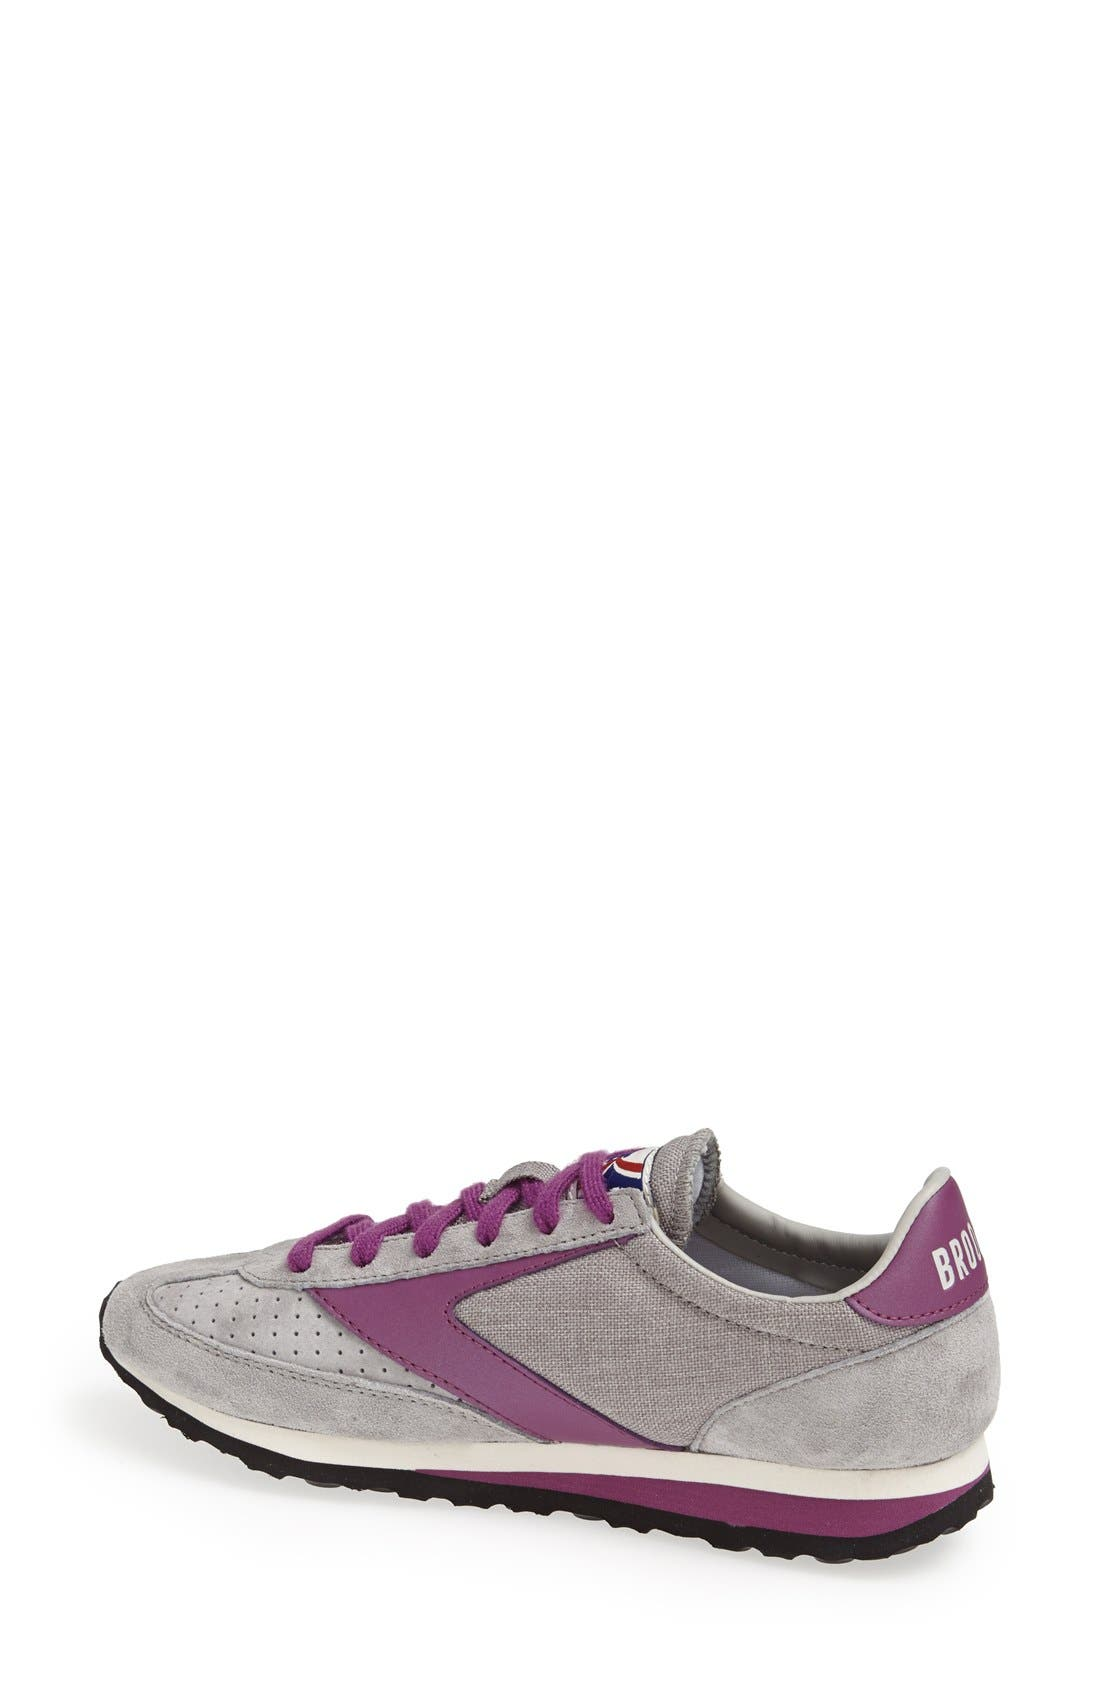 'Vanguard' Sneaker,                             Alternate thumbnail 154, color,